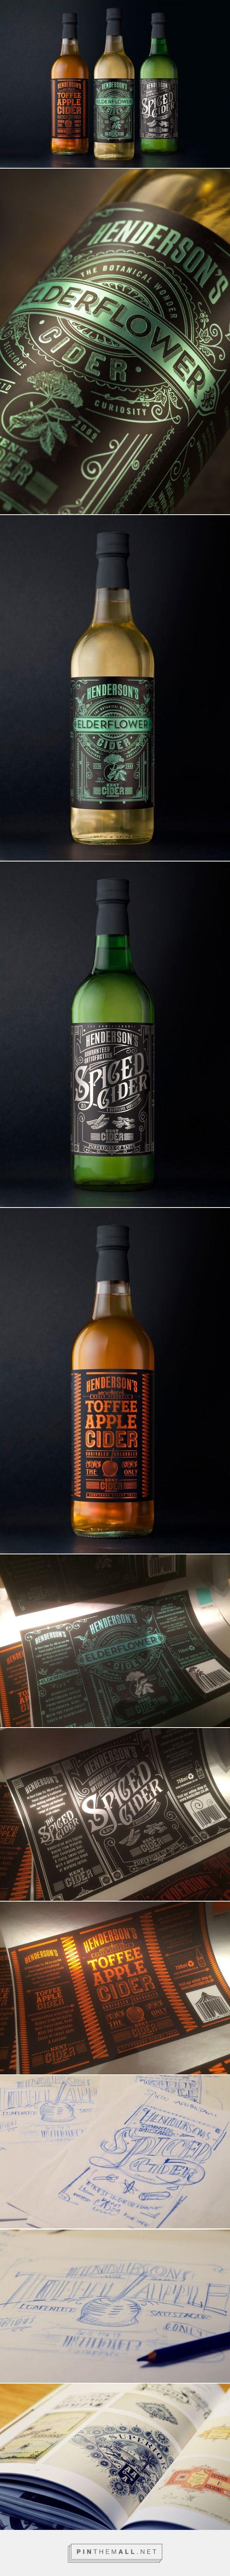 Henderson's #Cider #Packaging designed by Sand Creative - http://www.packagingoftheworld.com/2015/10/hendersons-cider-redesign.html